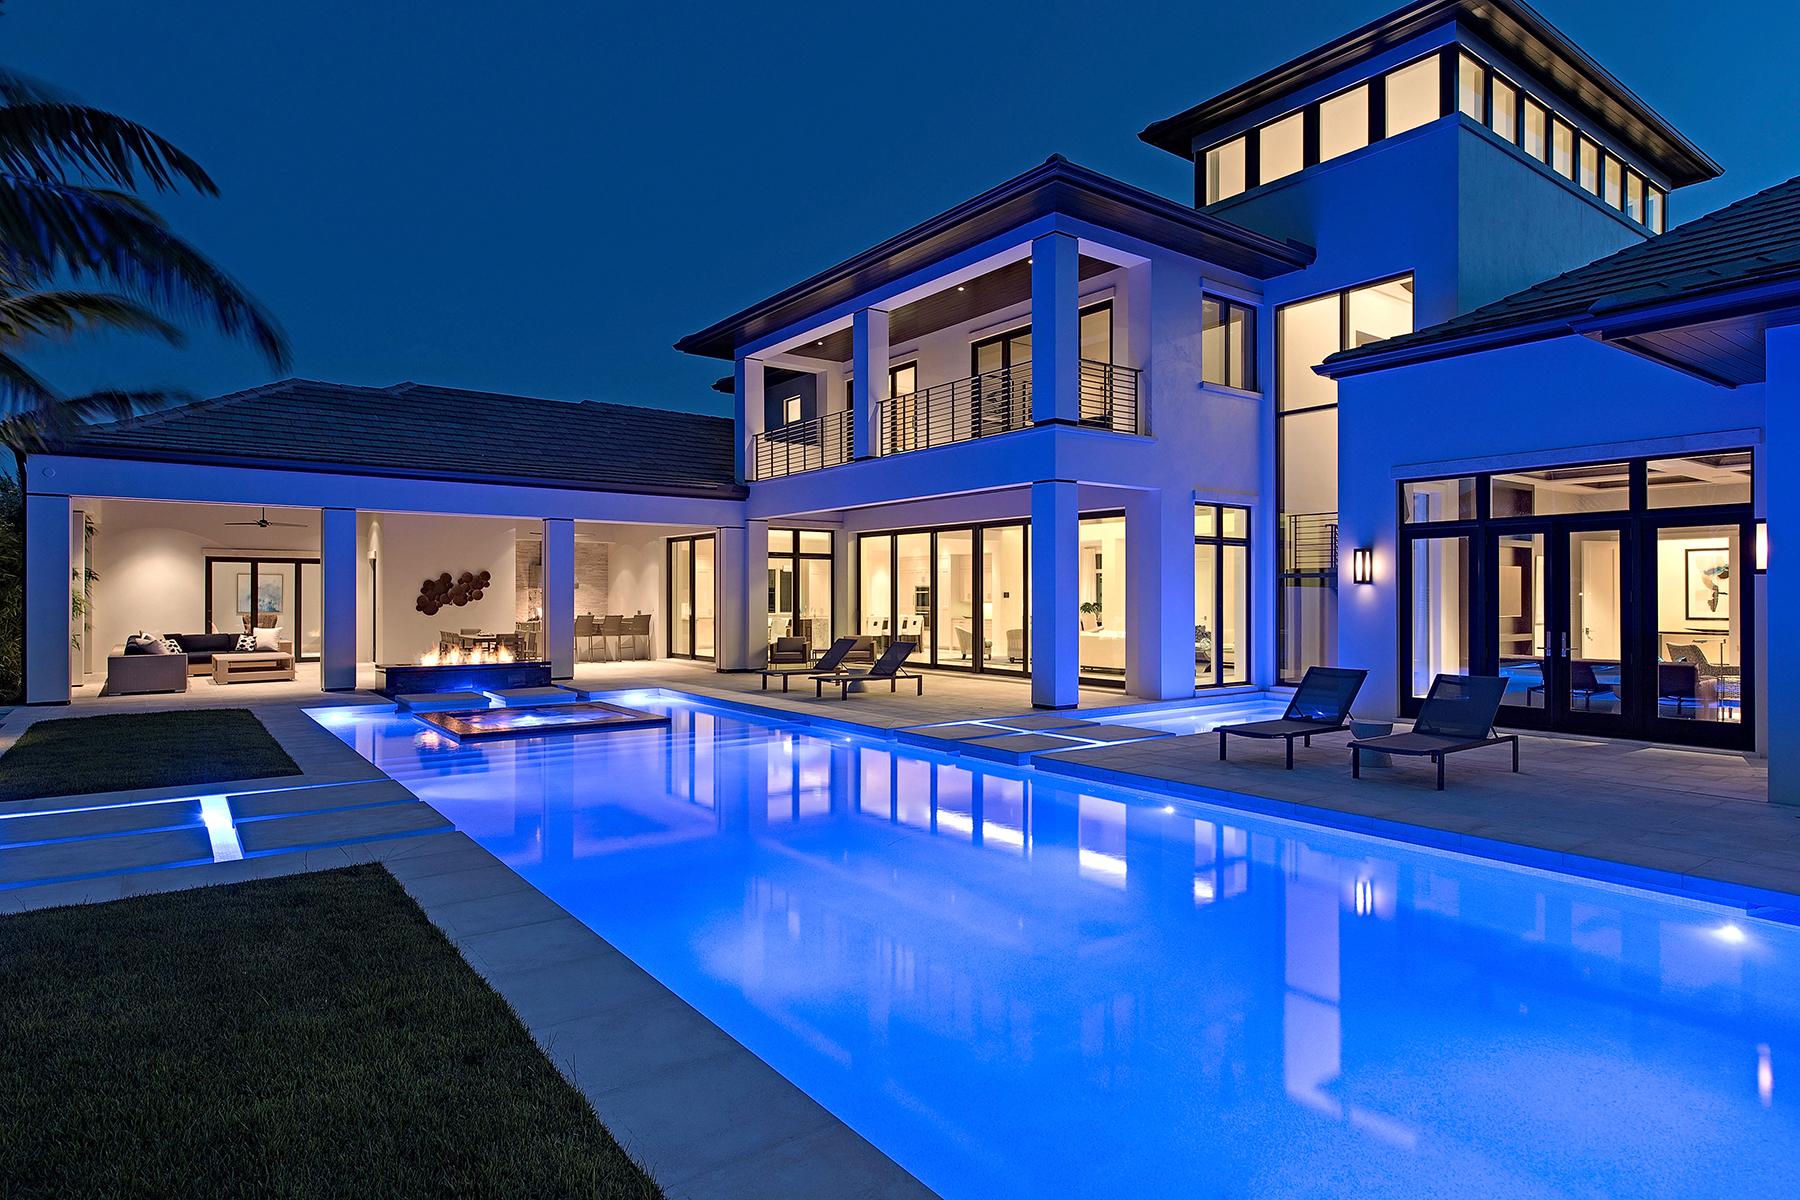 واحد منزل الأسرة للـ Sale في 1234 Gordon River Trl , Naples, FL 34105 1234 Gordon River Trl, Naples, Florida 34105 United States